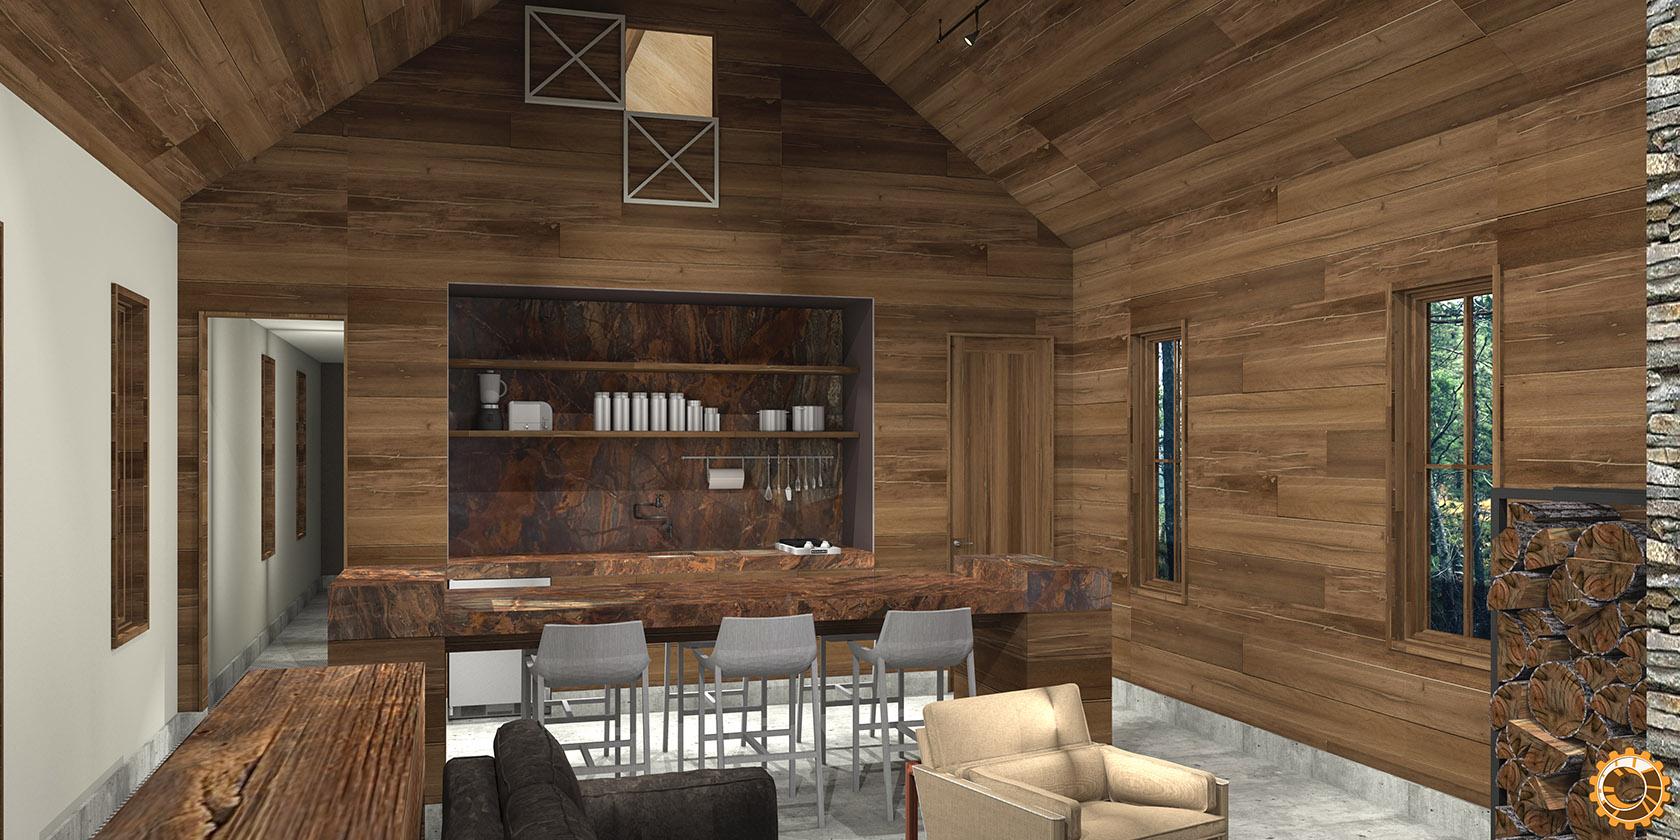 2016 0831 New Project – Hatchet Cabin